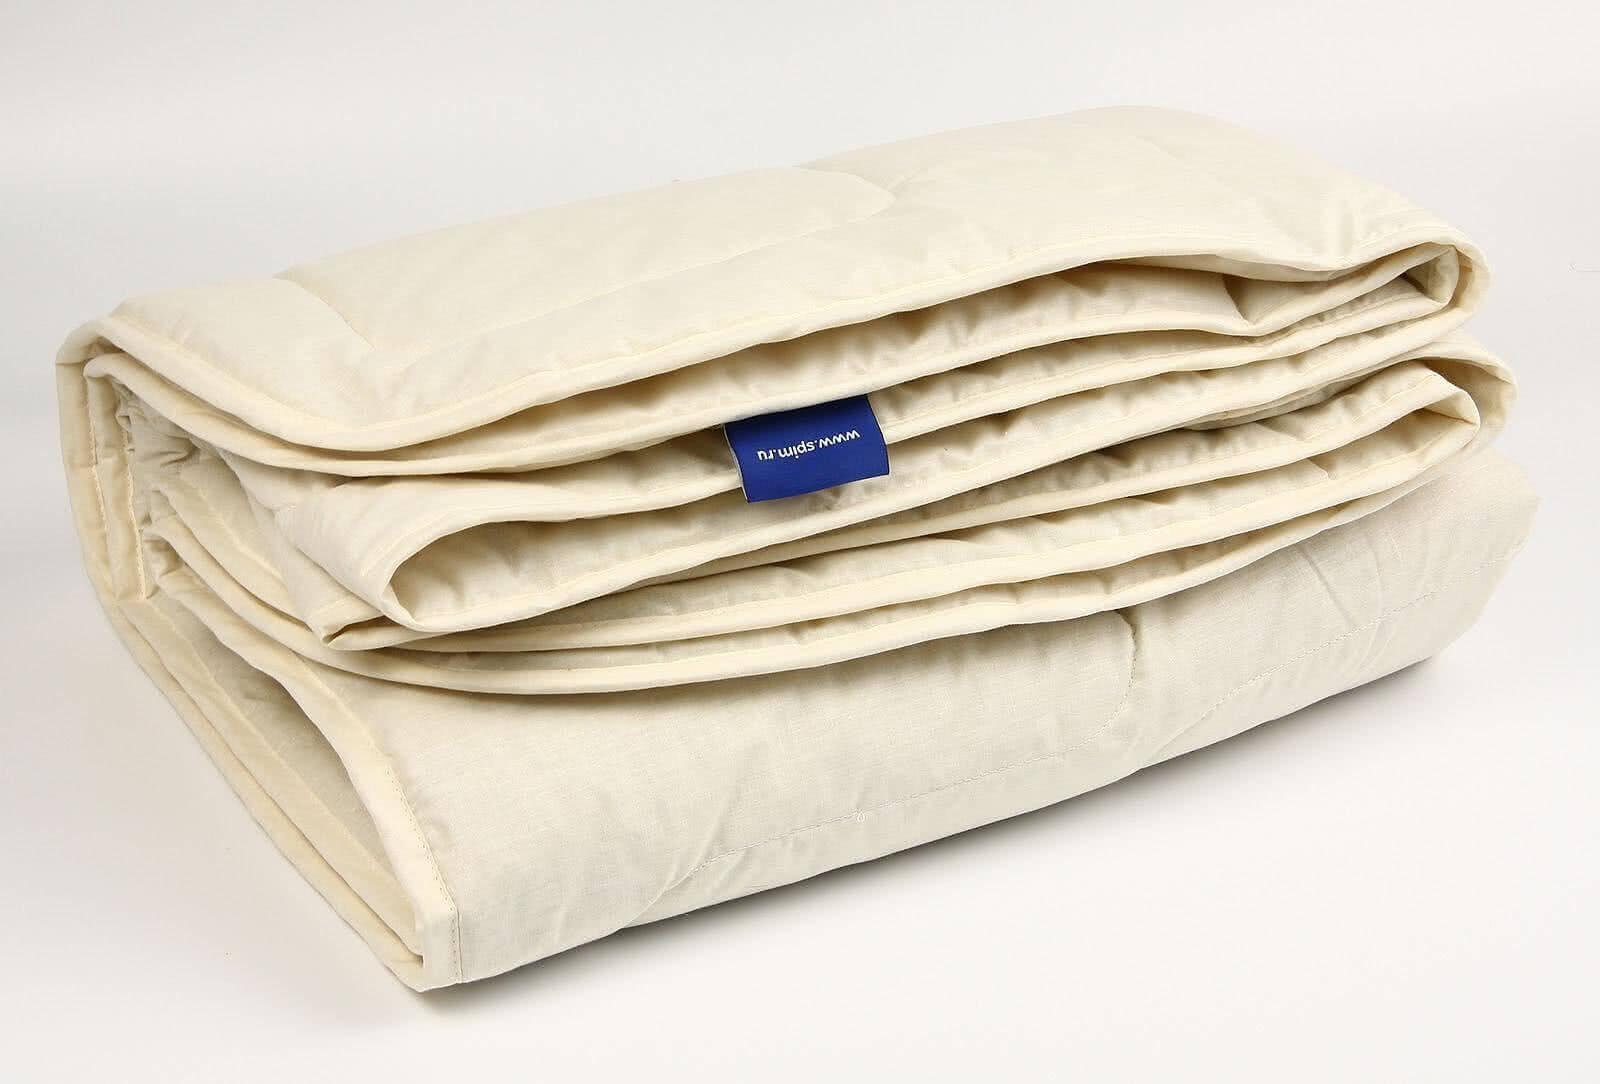 Одеяло шерстяное SoftWool - Петербург